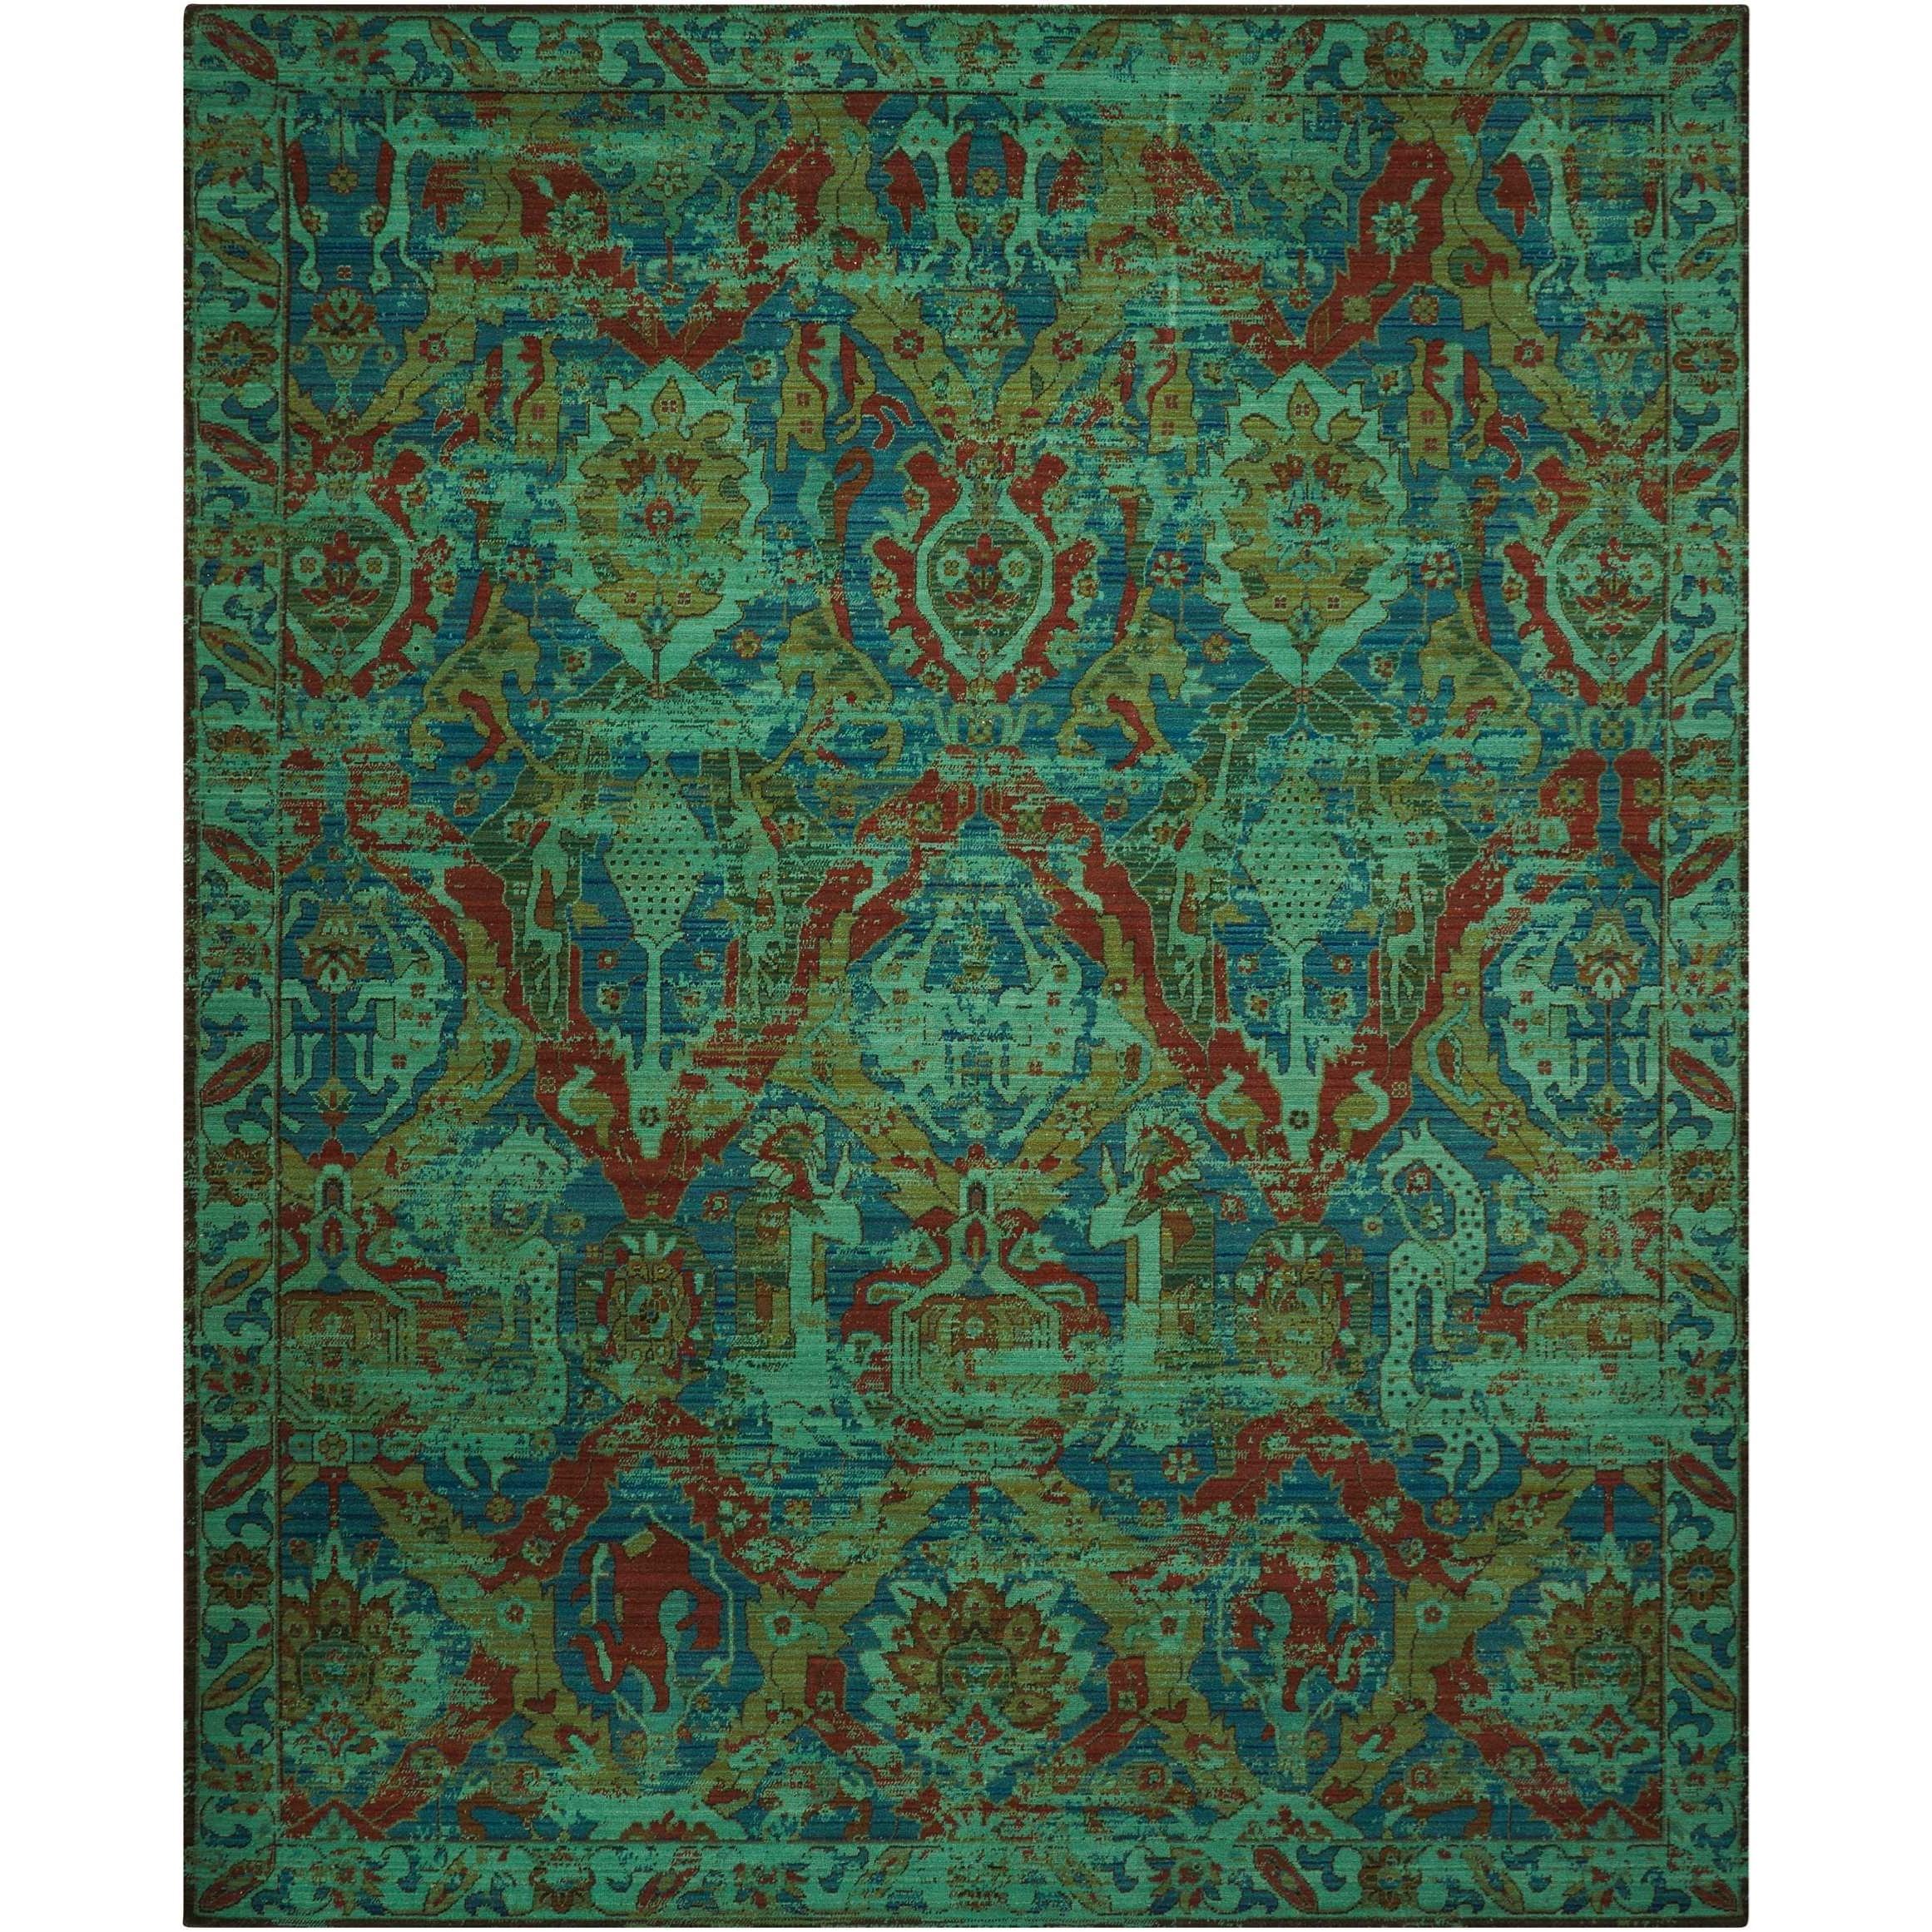 12' x 15' Turquoise Rectangle Rug